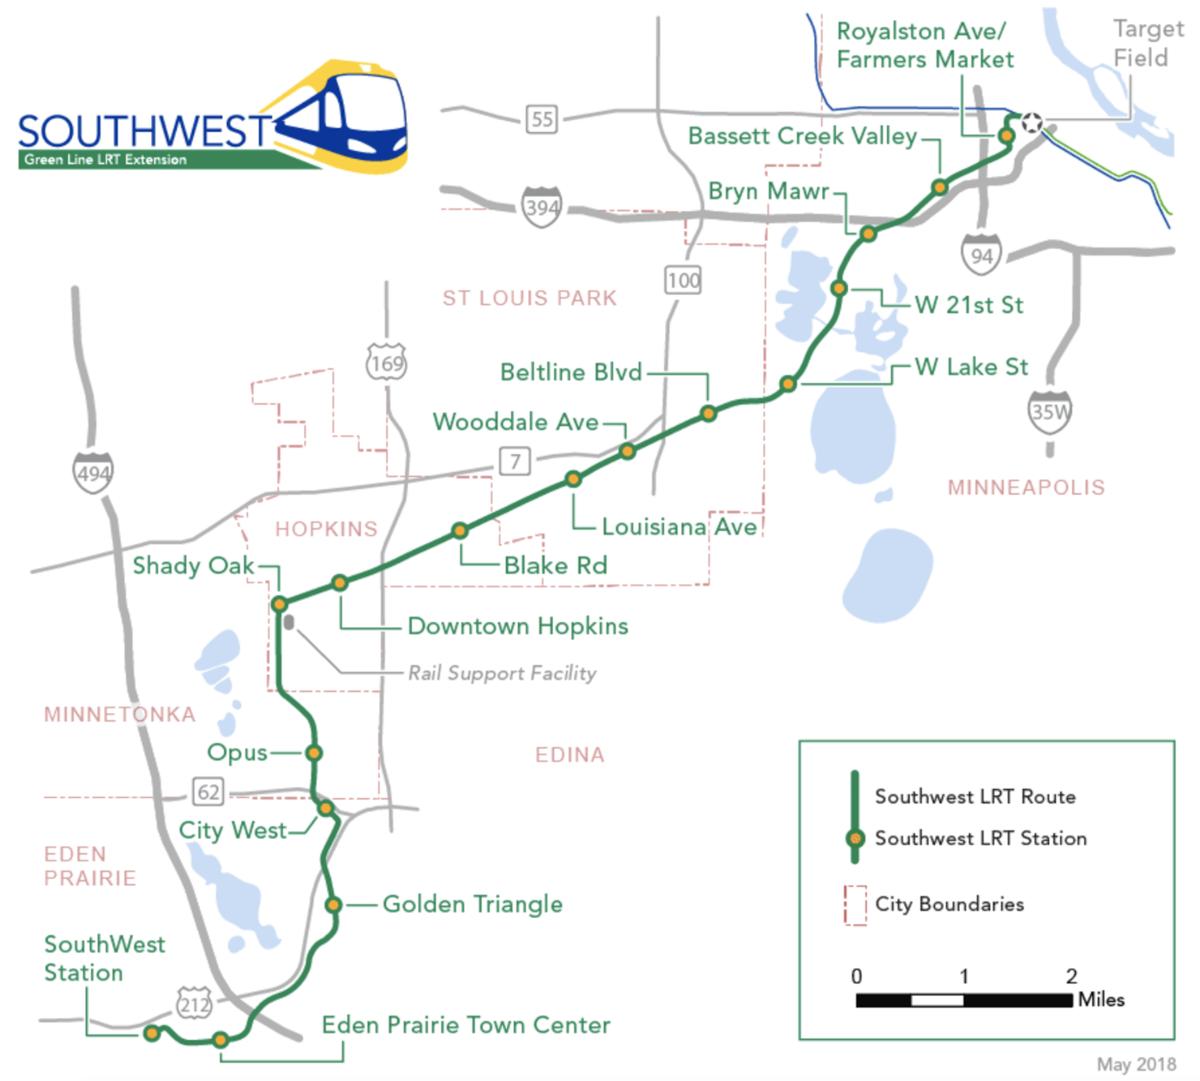 Celebratory groundbreaking kicks off Southwest Light Rail project